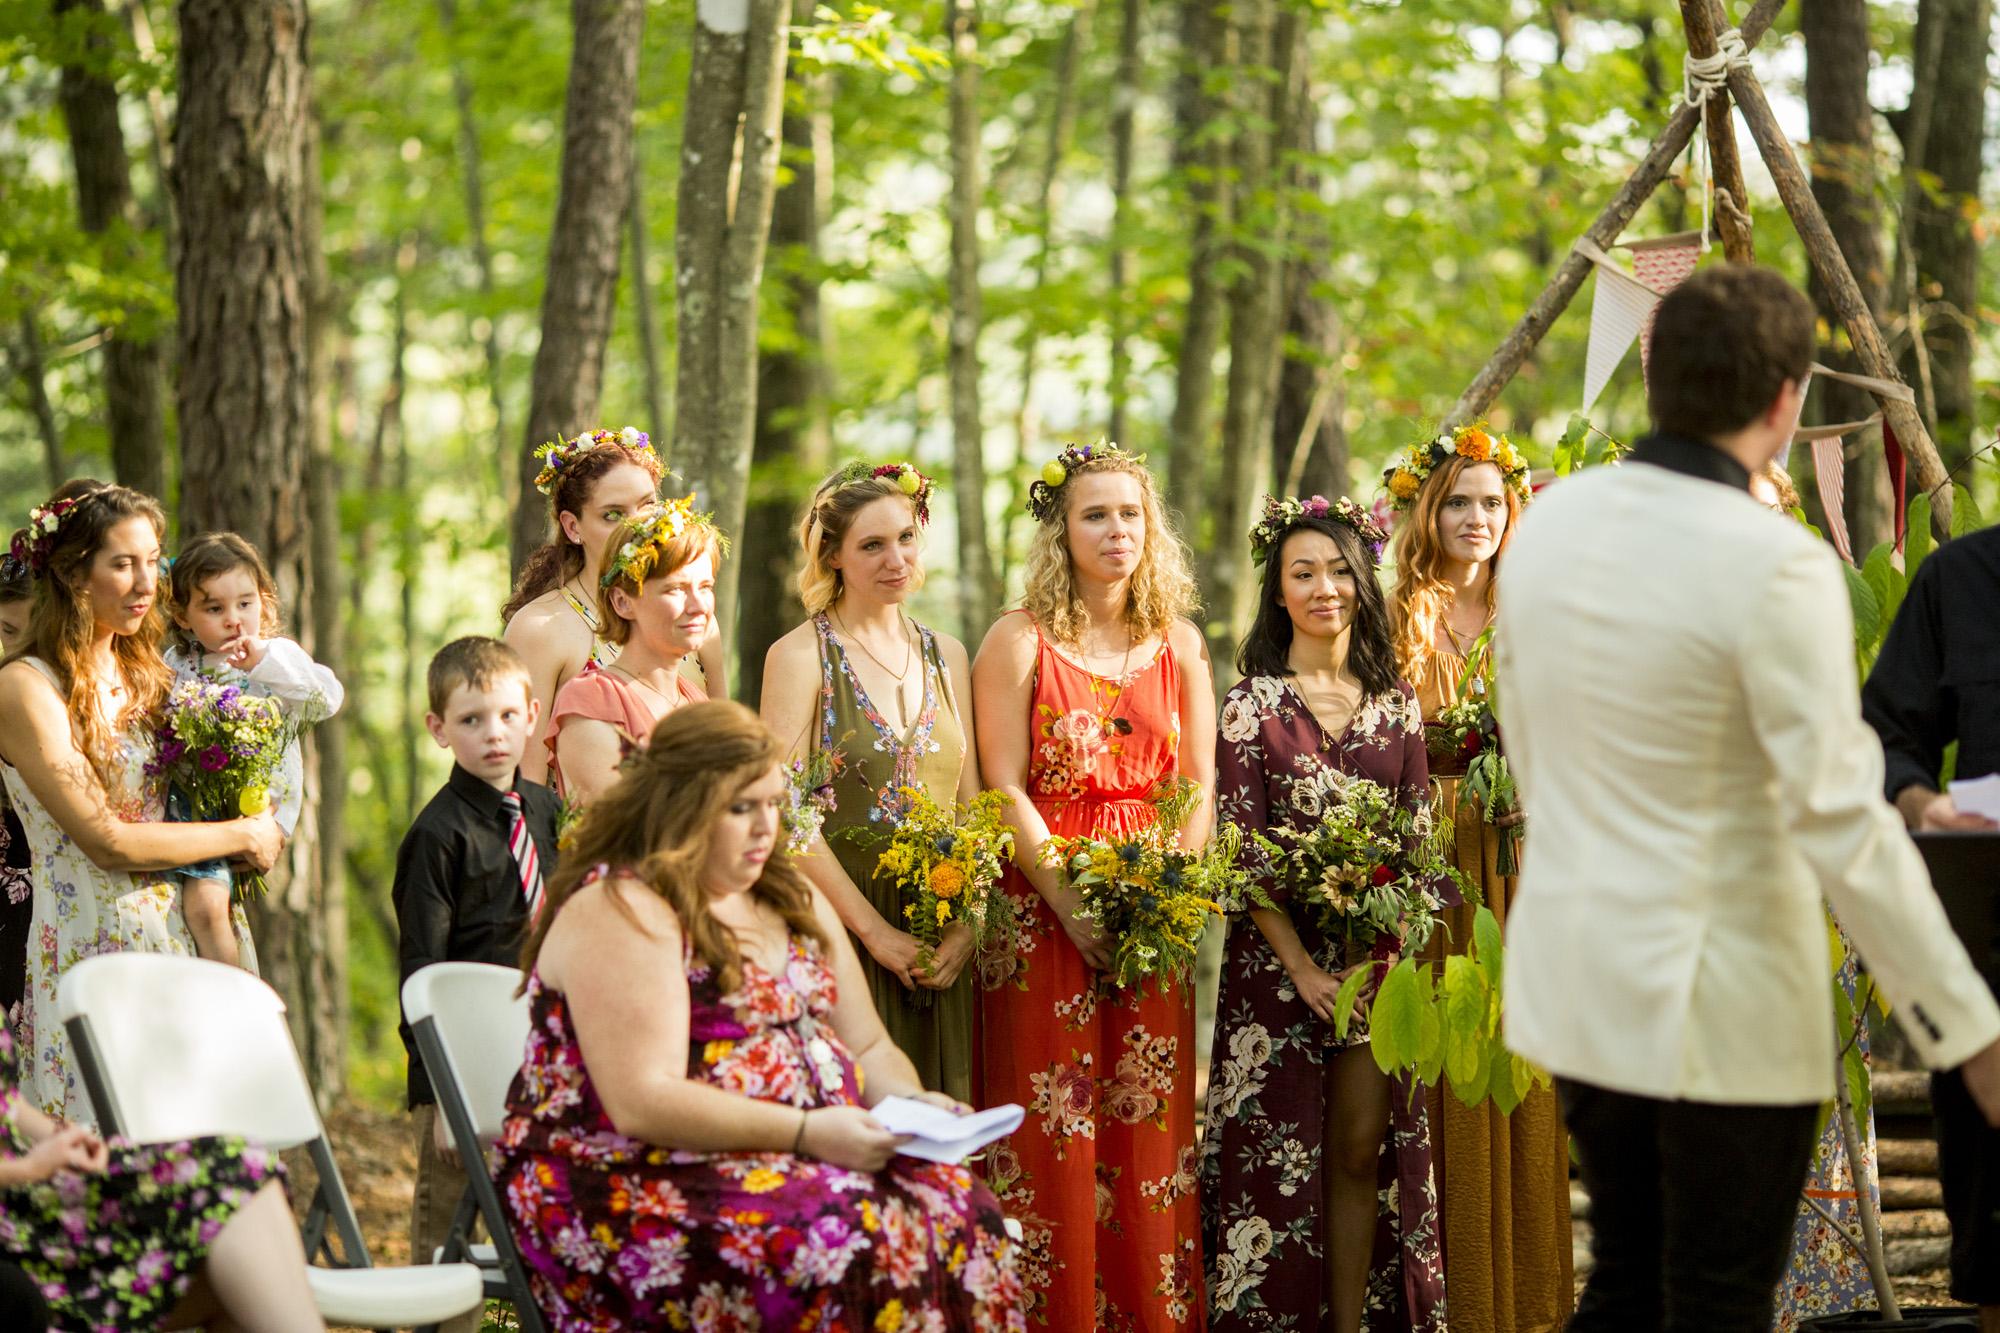 Seriously_Sabrina_Photography_Red_River_Gorge_Kentucky_Wedding_ShawnDana114.jpg